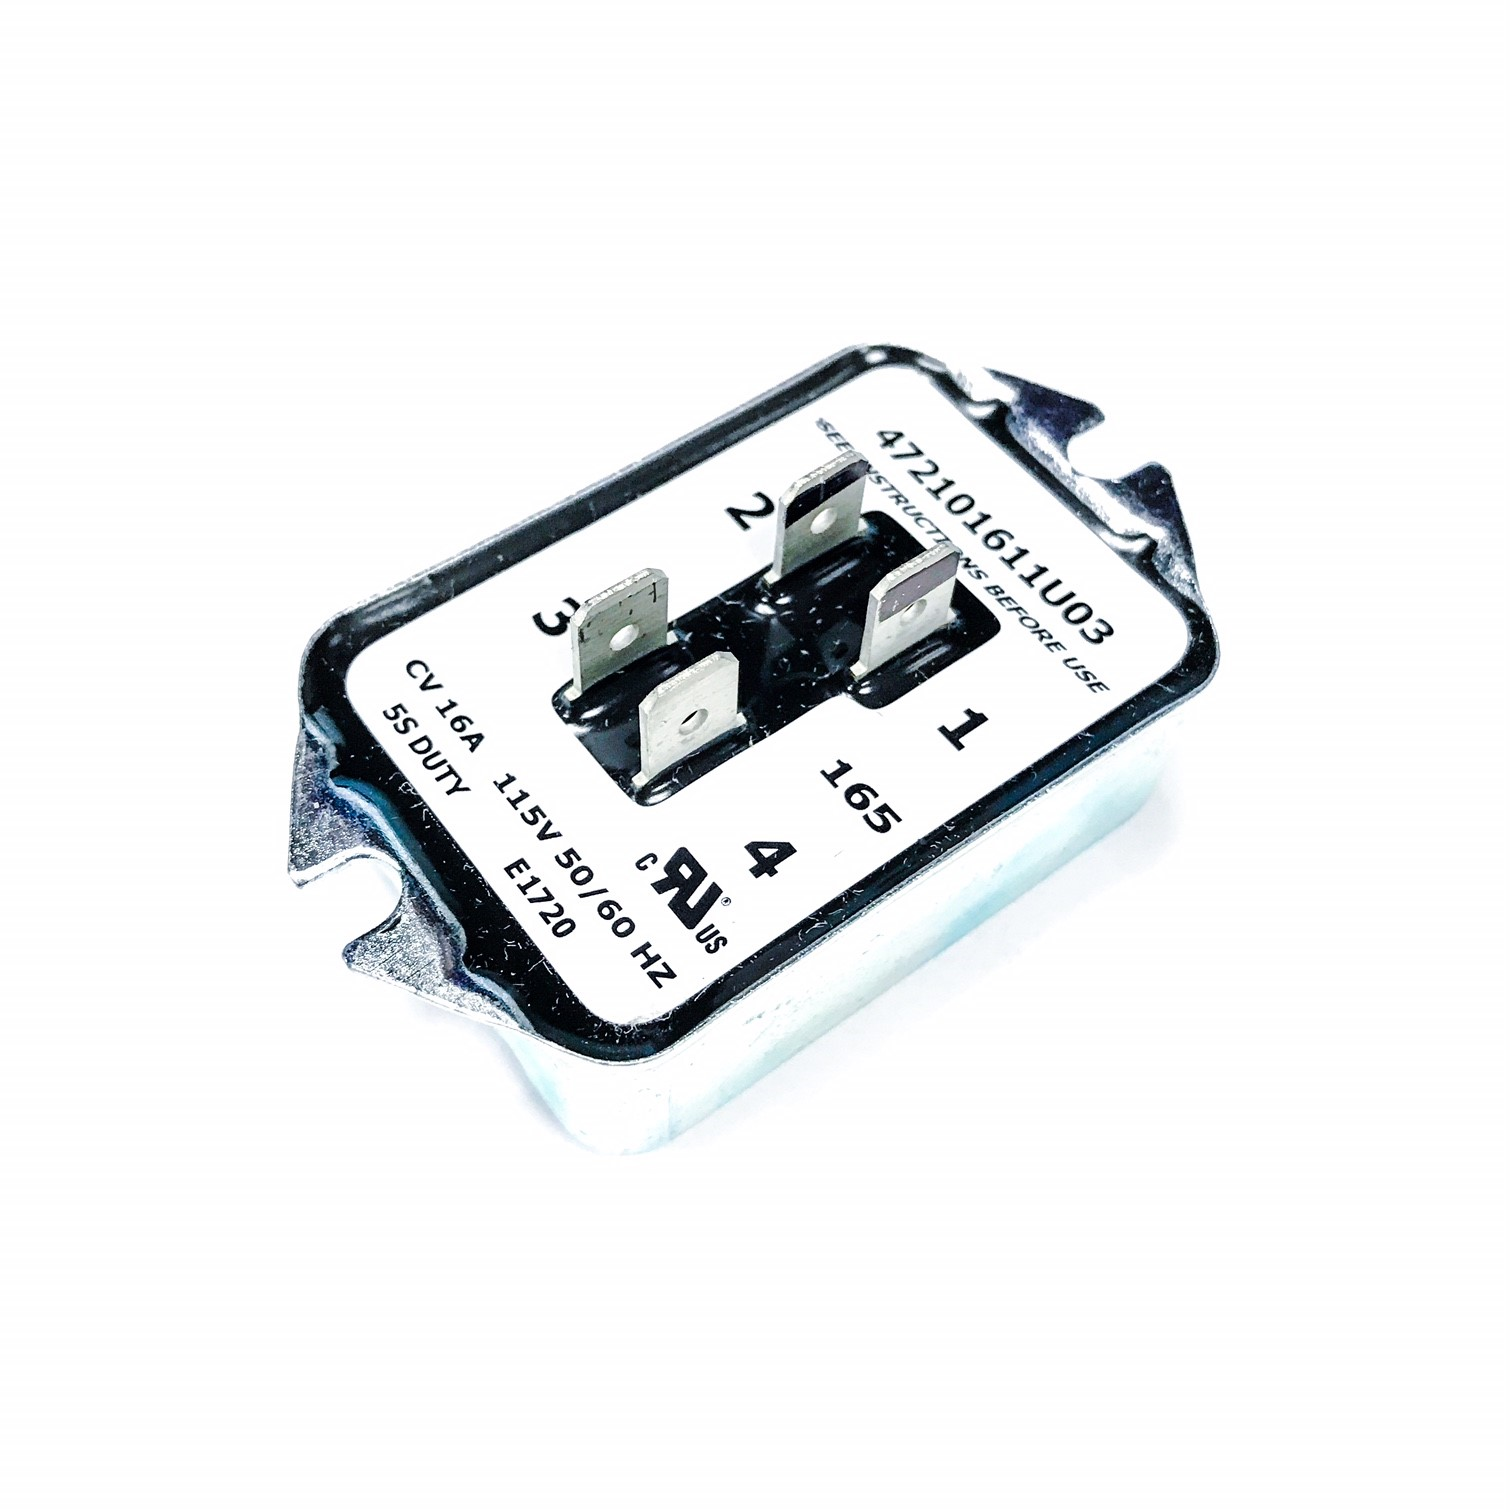 472101611u02 stearns sinpac switch 115v 16a rh witmermotorservice com